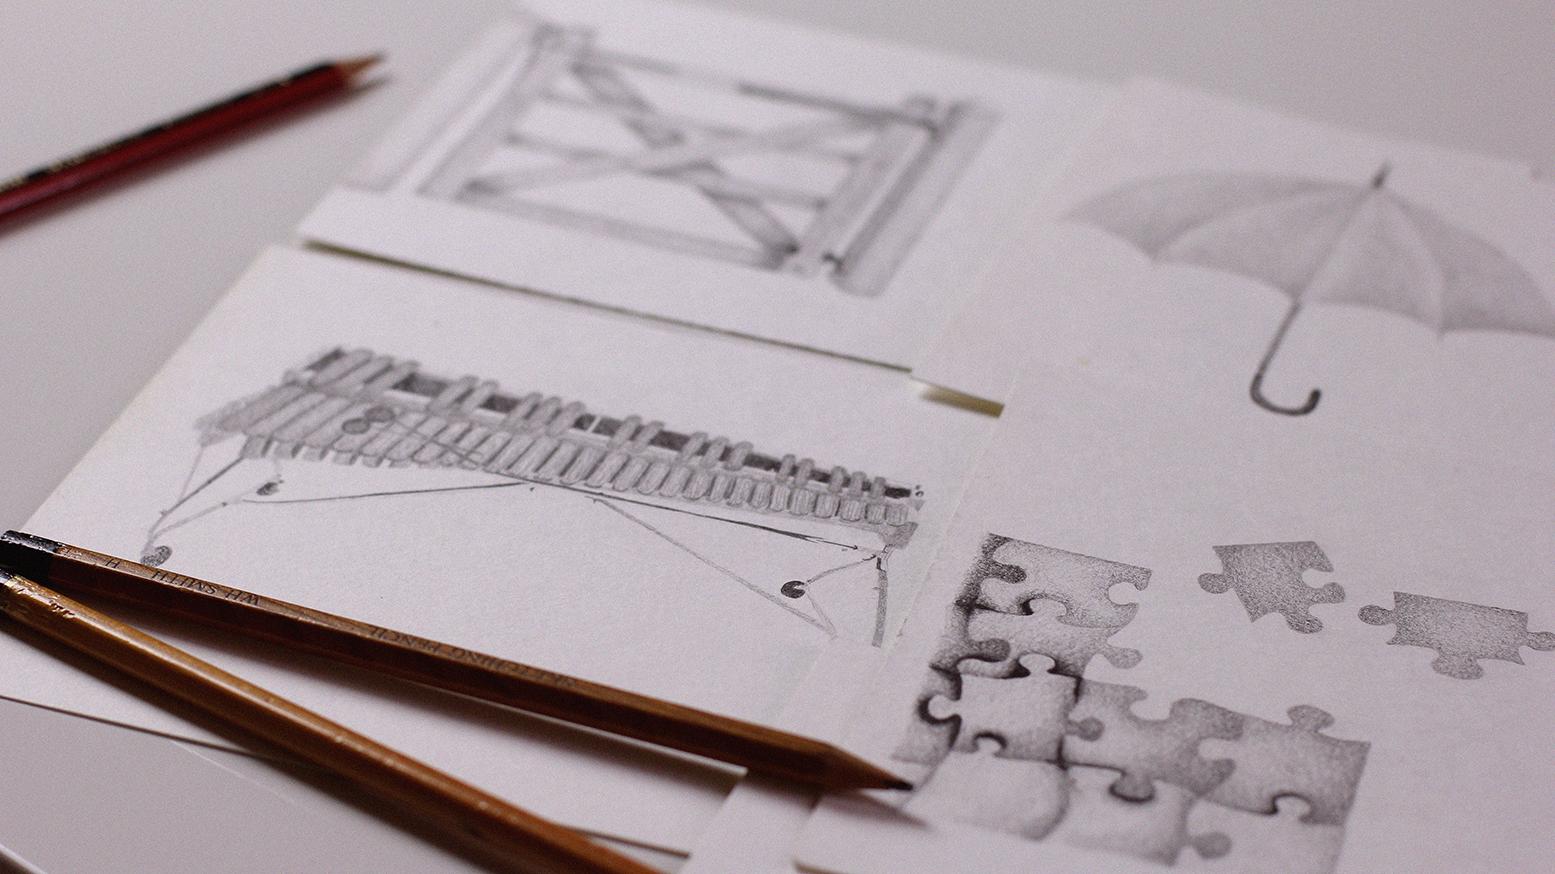 Gallery Pencil illustration copy.jpg